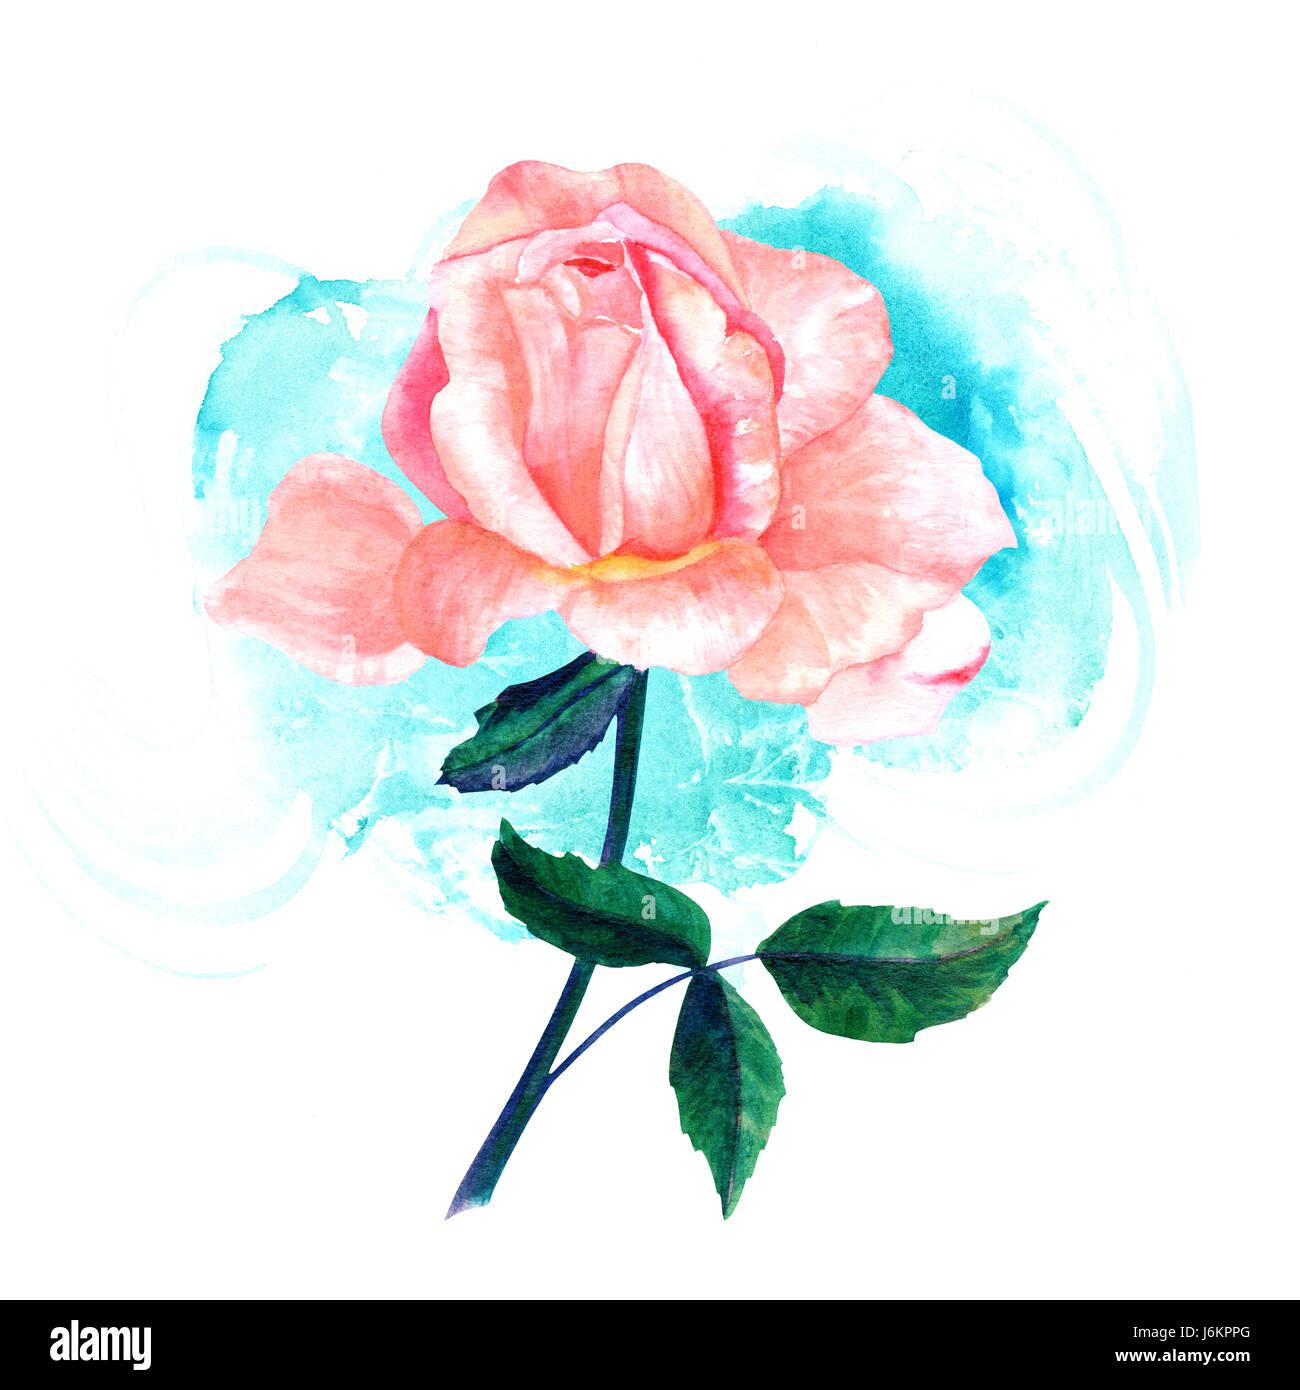 Dibujo De Acuarela De Tierna Rosa Rosa Flor Pintado A Mano De